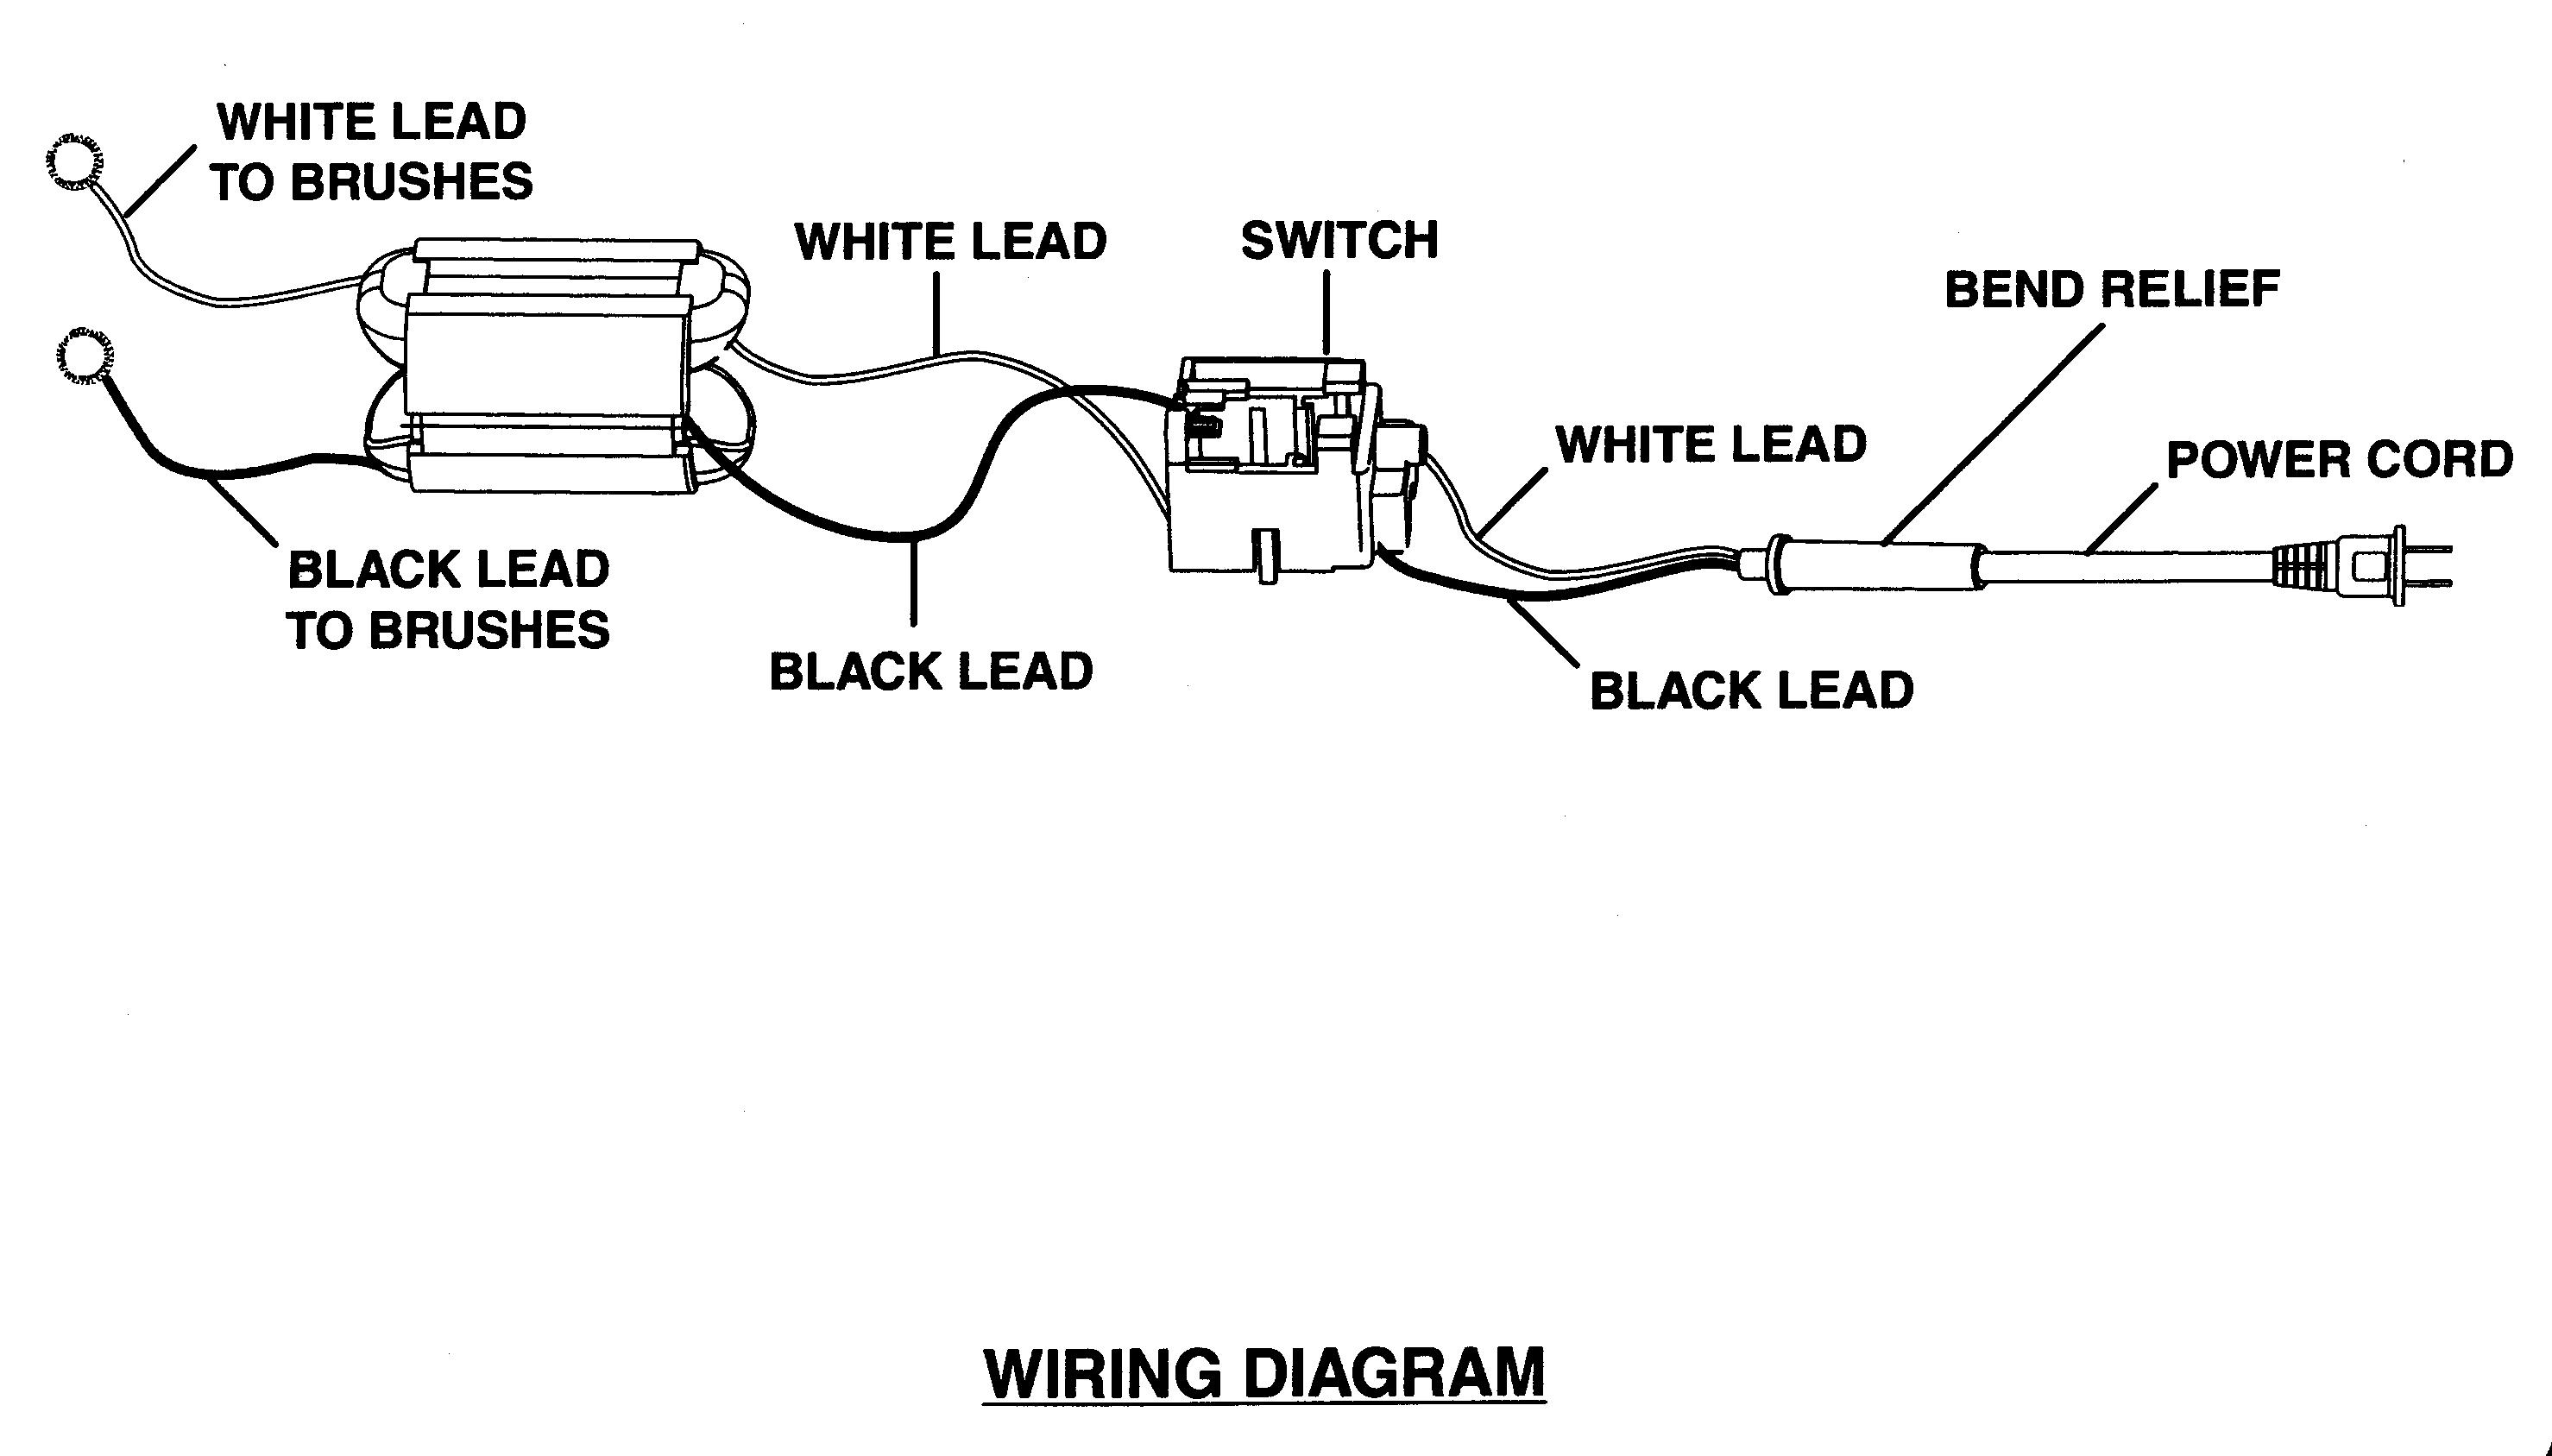 Grinder Wiring Diagram Ford 5000 Tractor Wiring Harness Begeboy Wiring Diagram Source